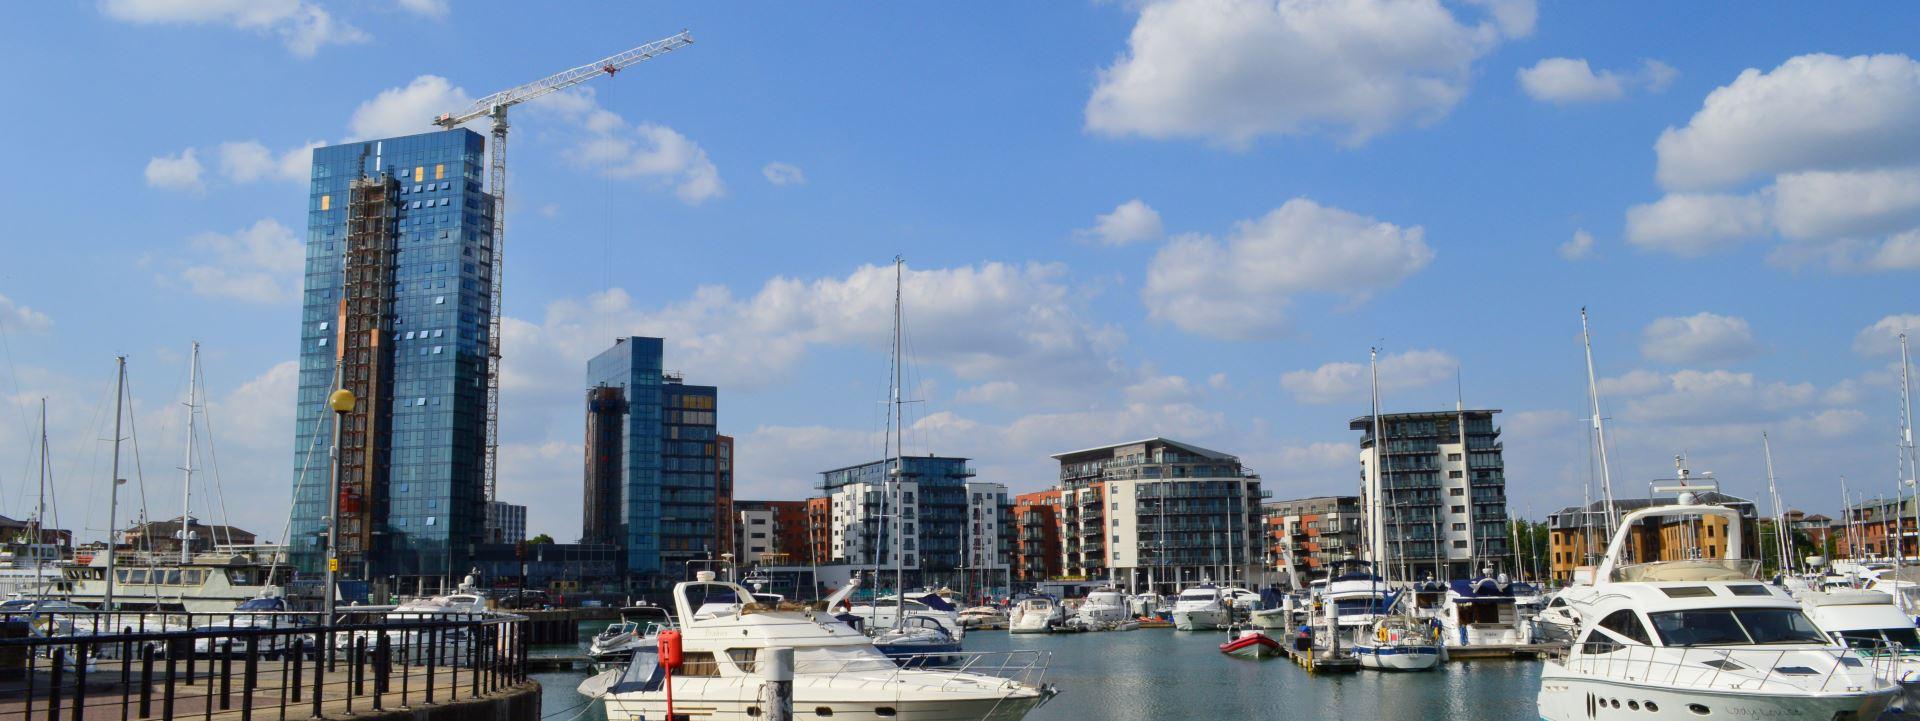 Mortgage Broker Southampton Water Front